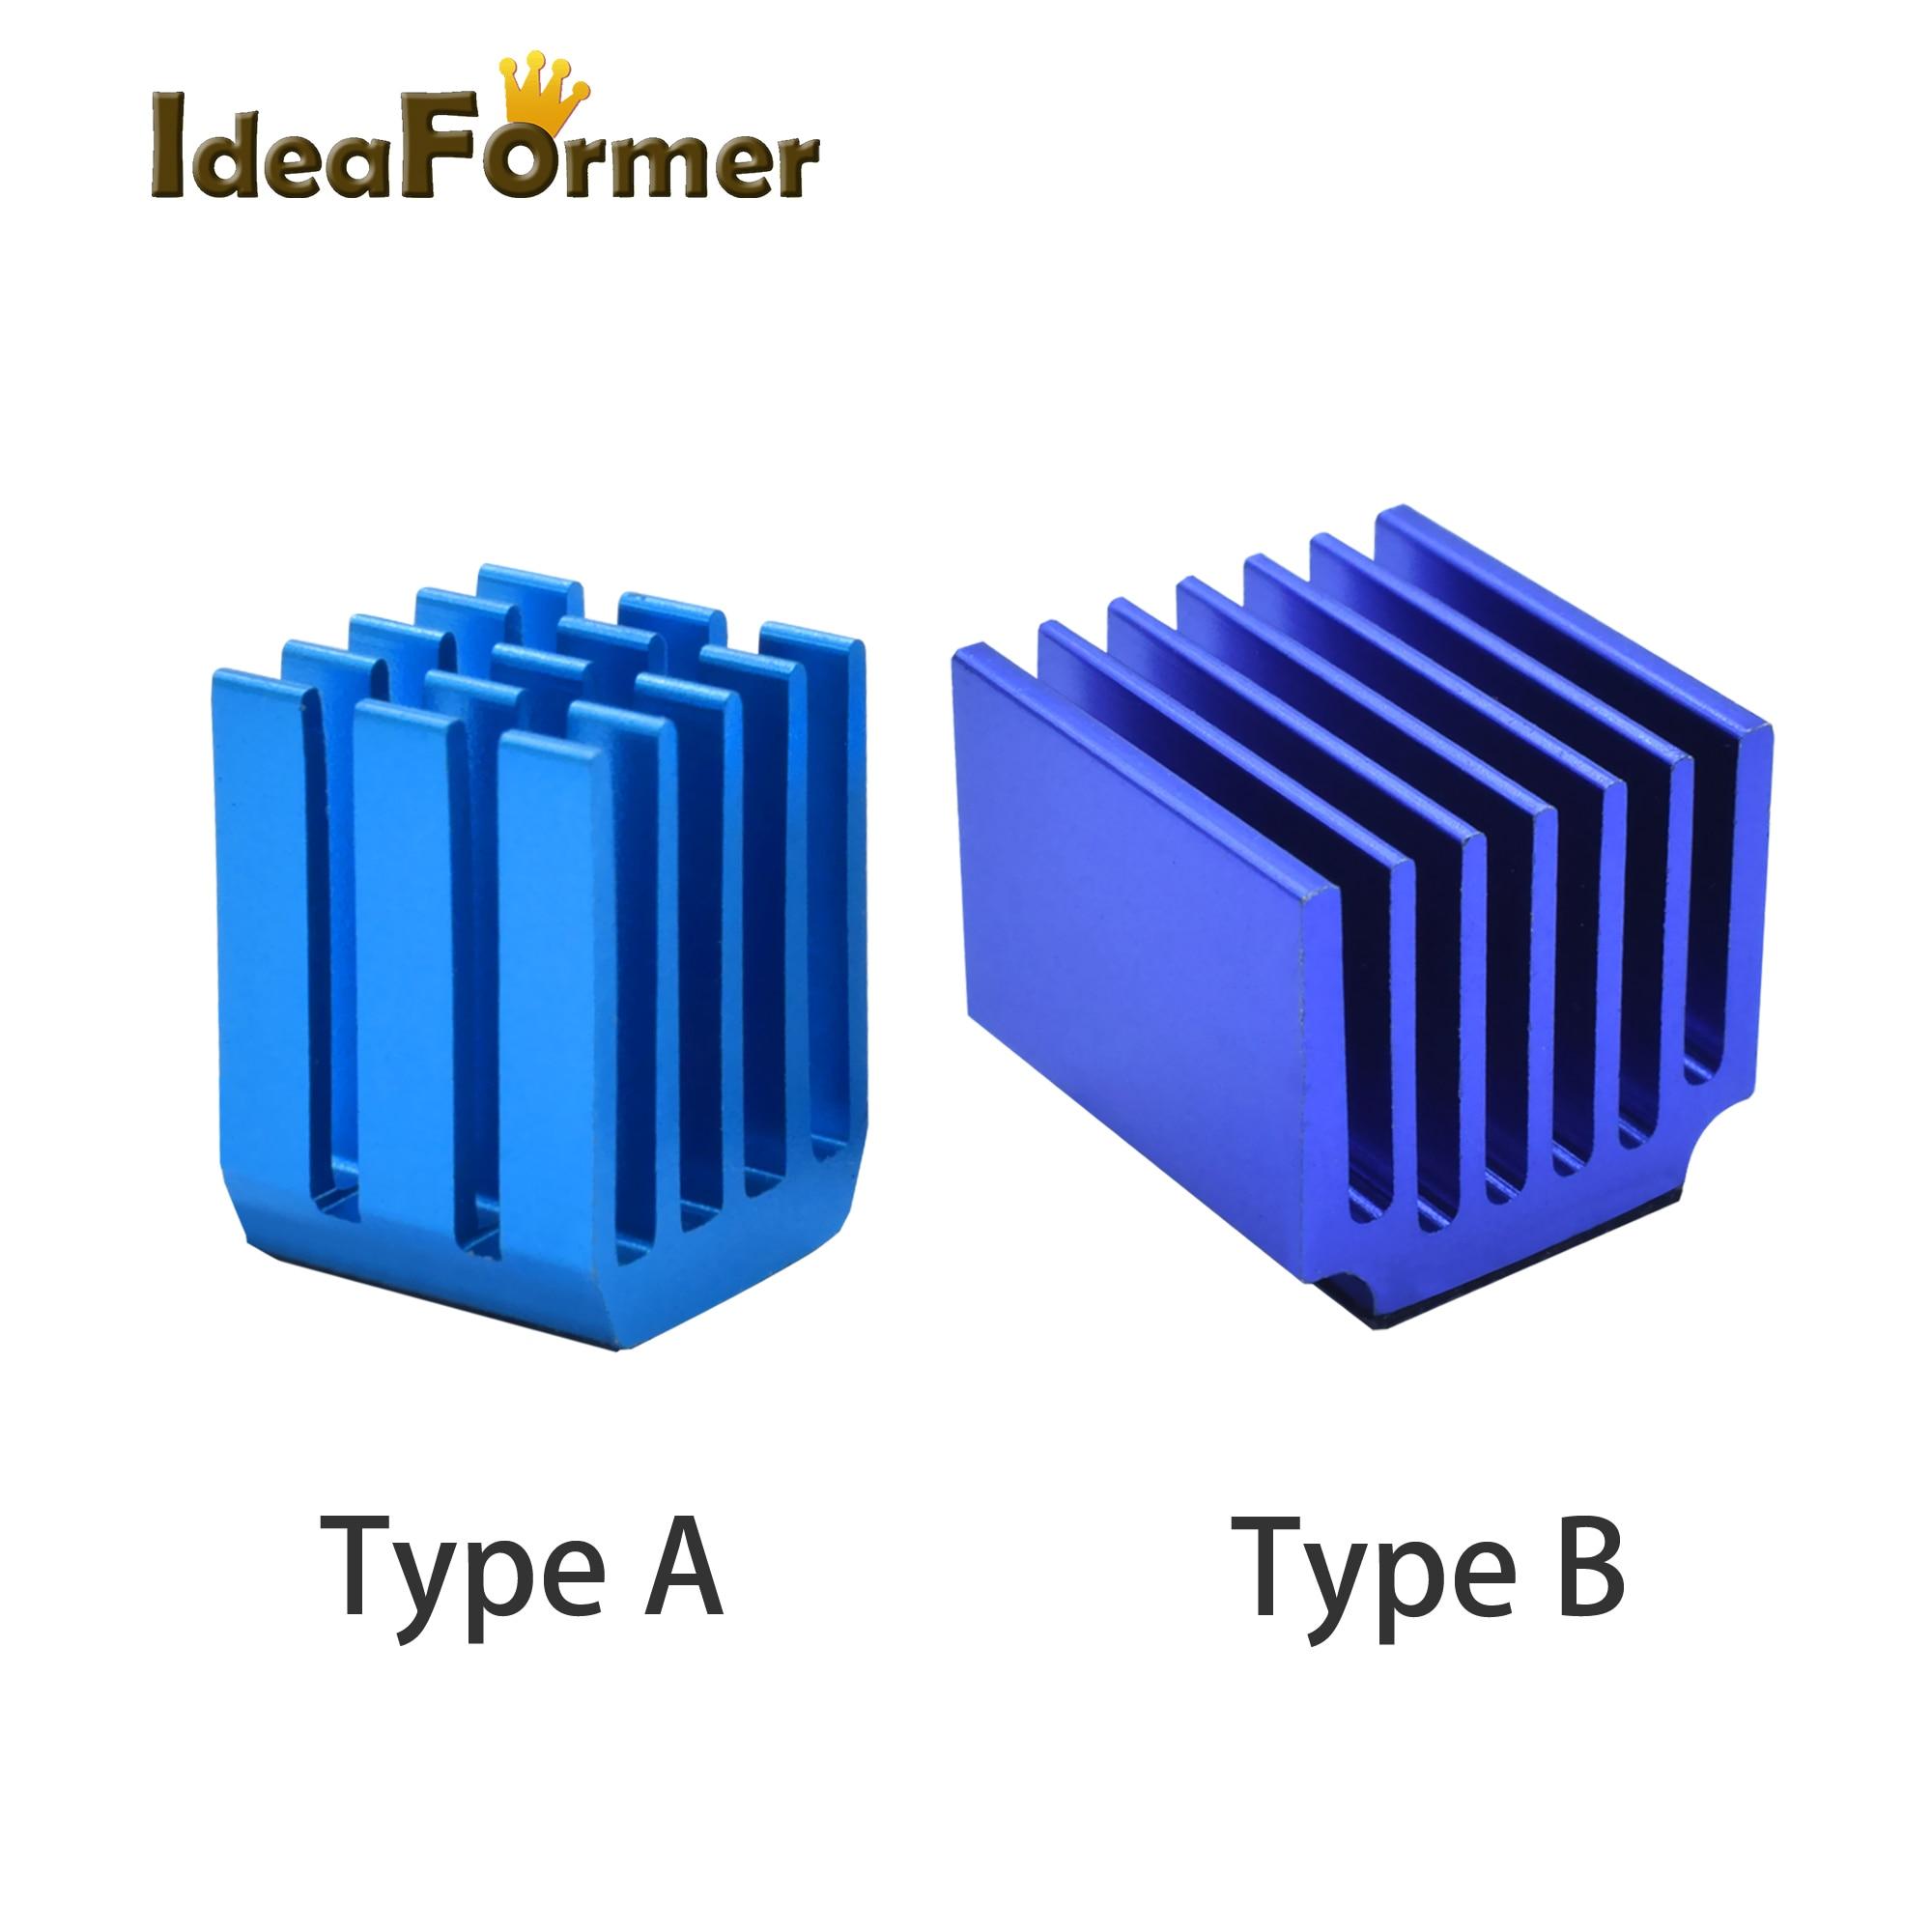 4/5/10pcs/lot 3D Printer Parts Stepper Motor Driver Heat Sinks Cooling Block Heatsink For TMC2100 LV8729 DRV8825 Drive Modules